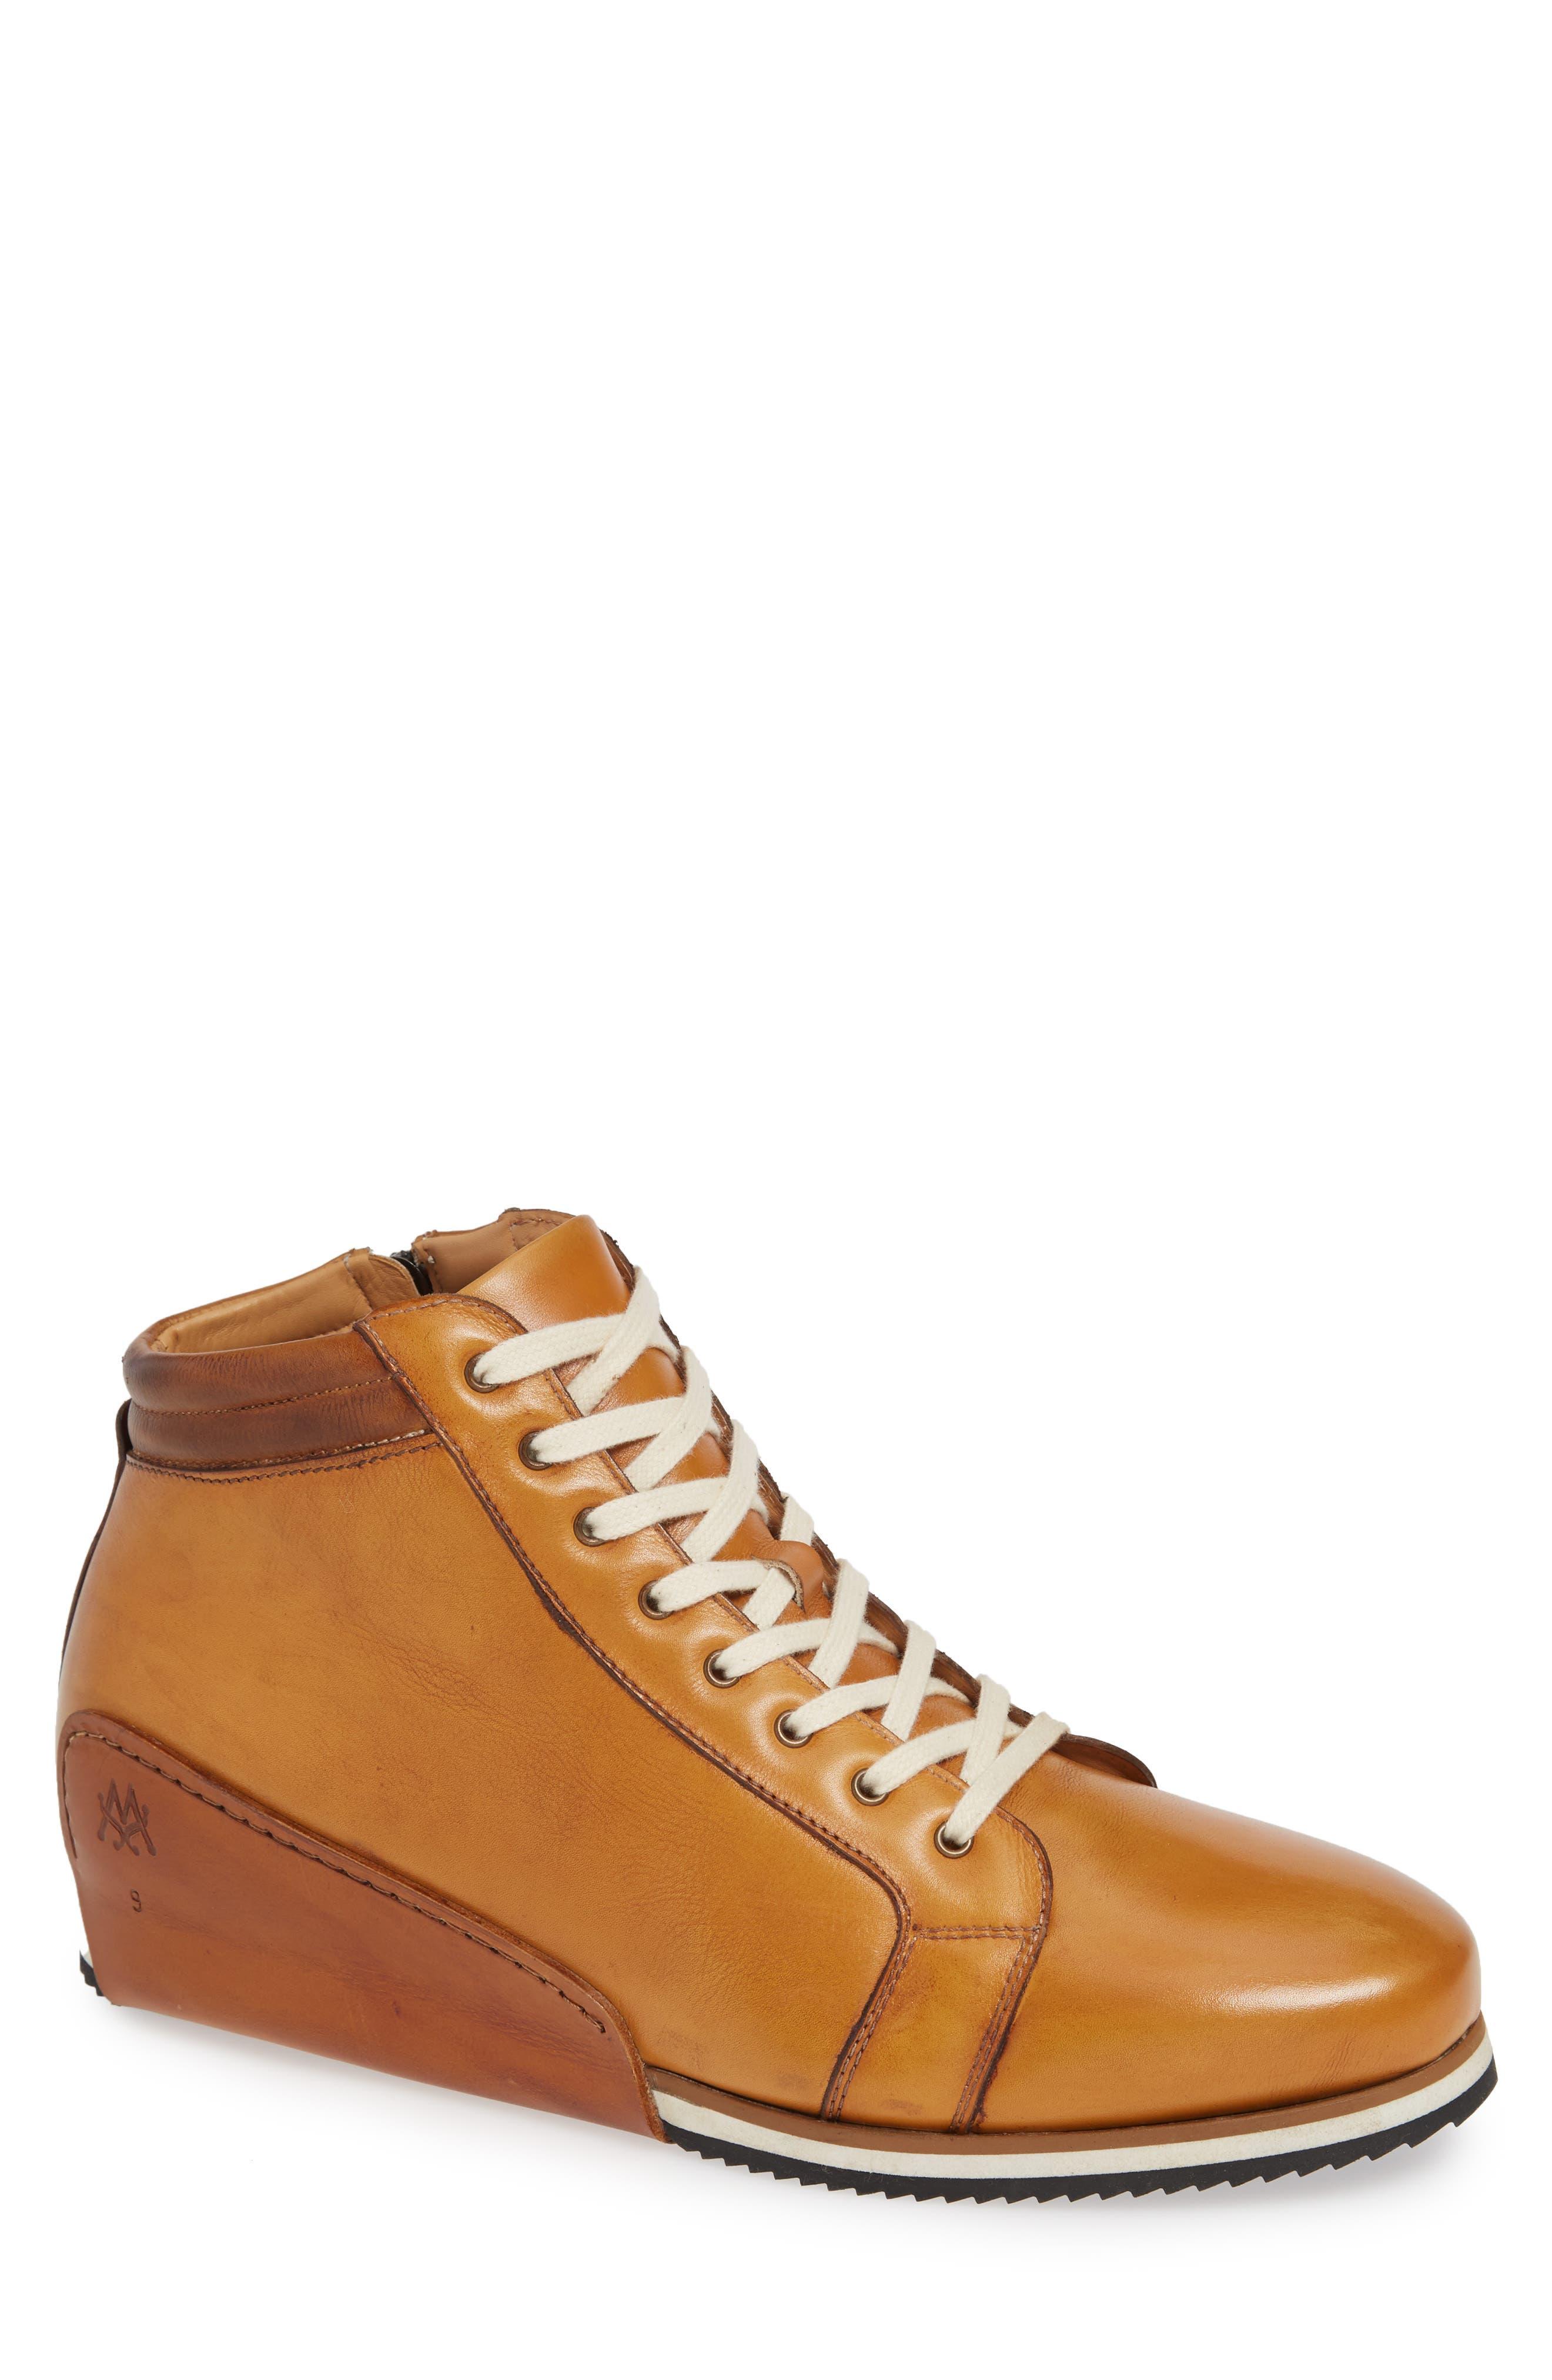 Niro Sneaker,                         Main,                         color, TAN LEATHER